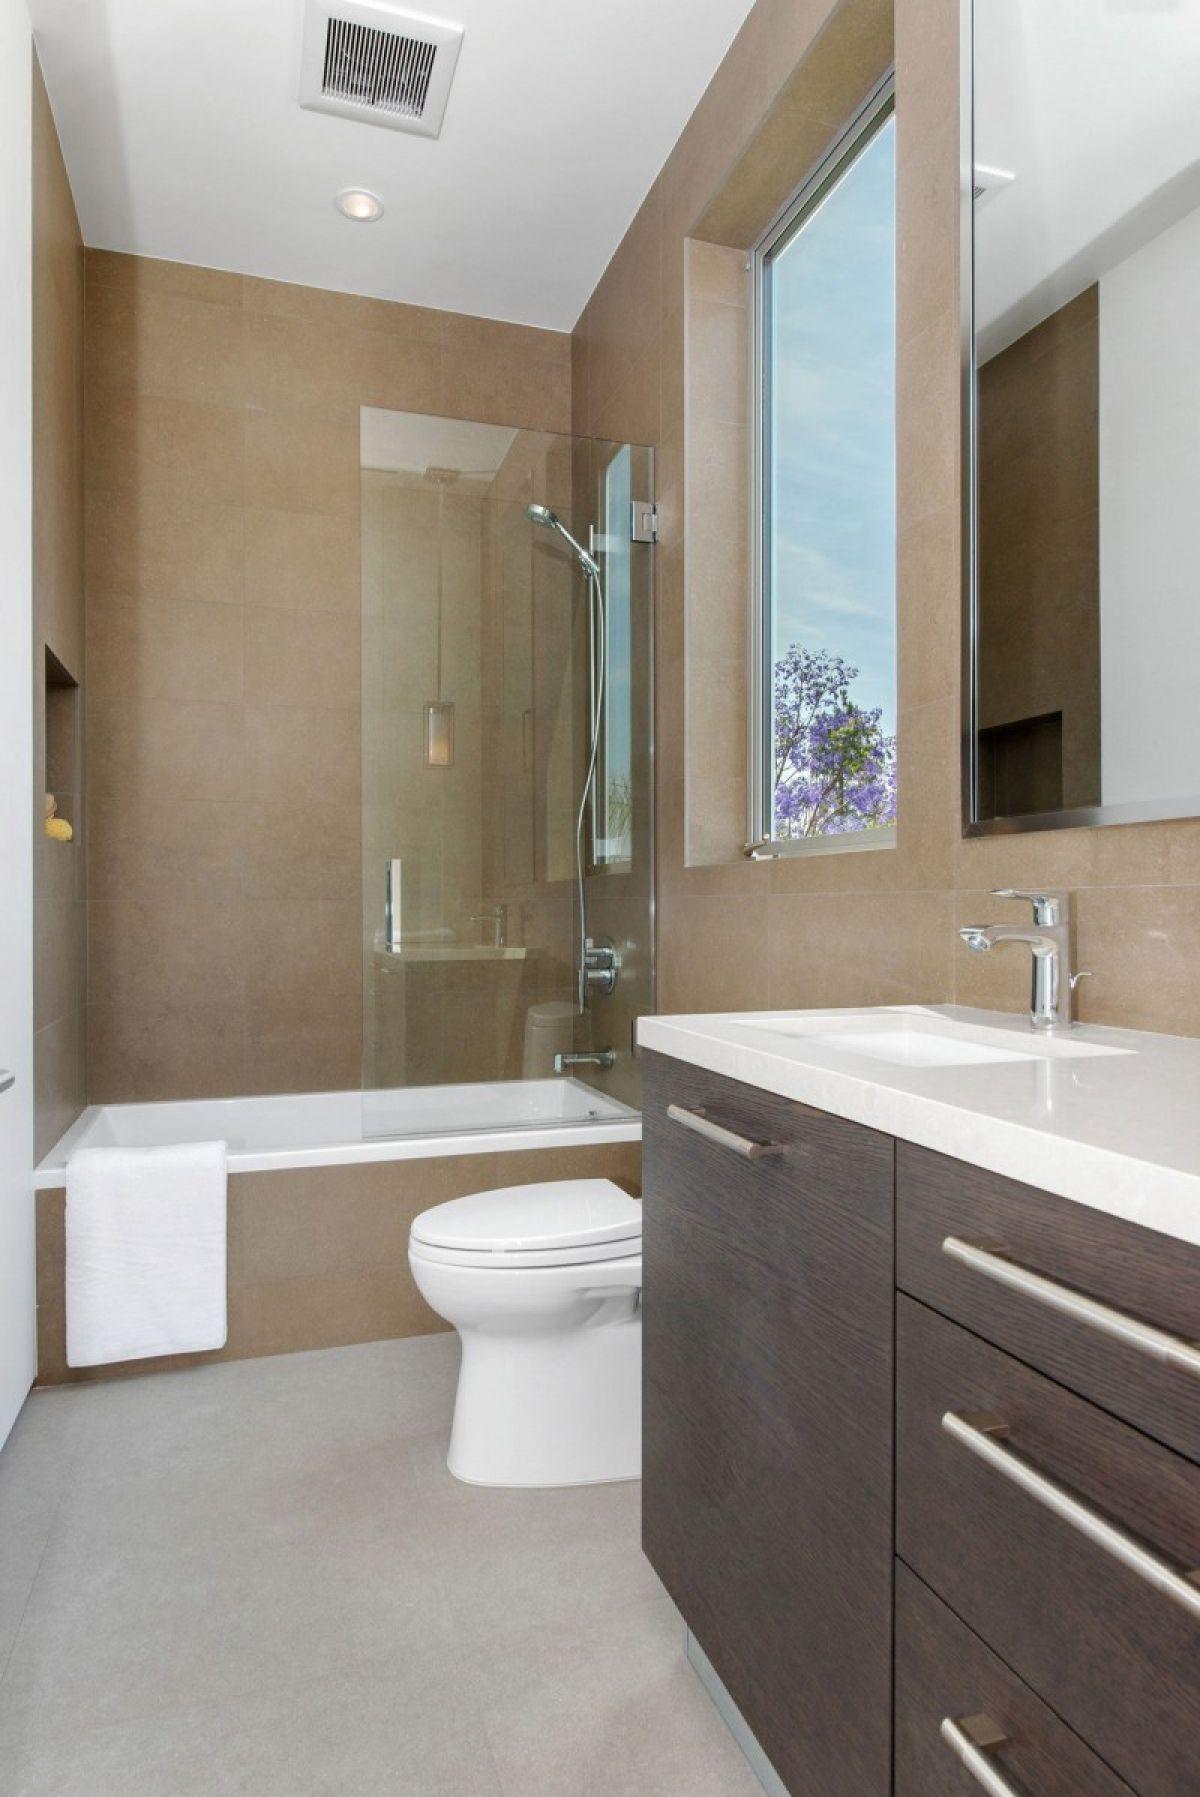 Узкая ванная комната с окном